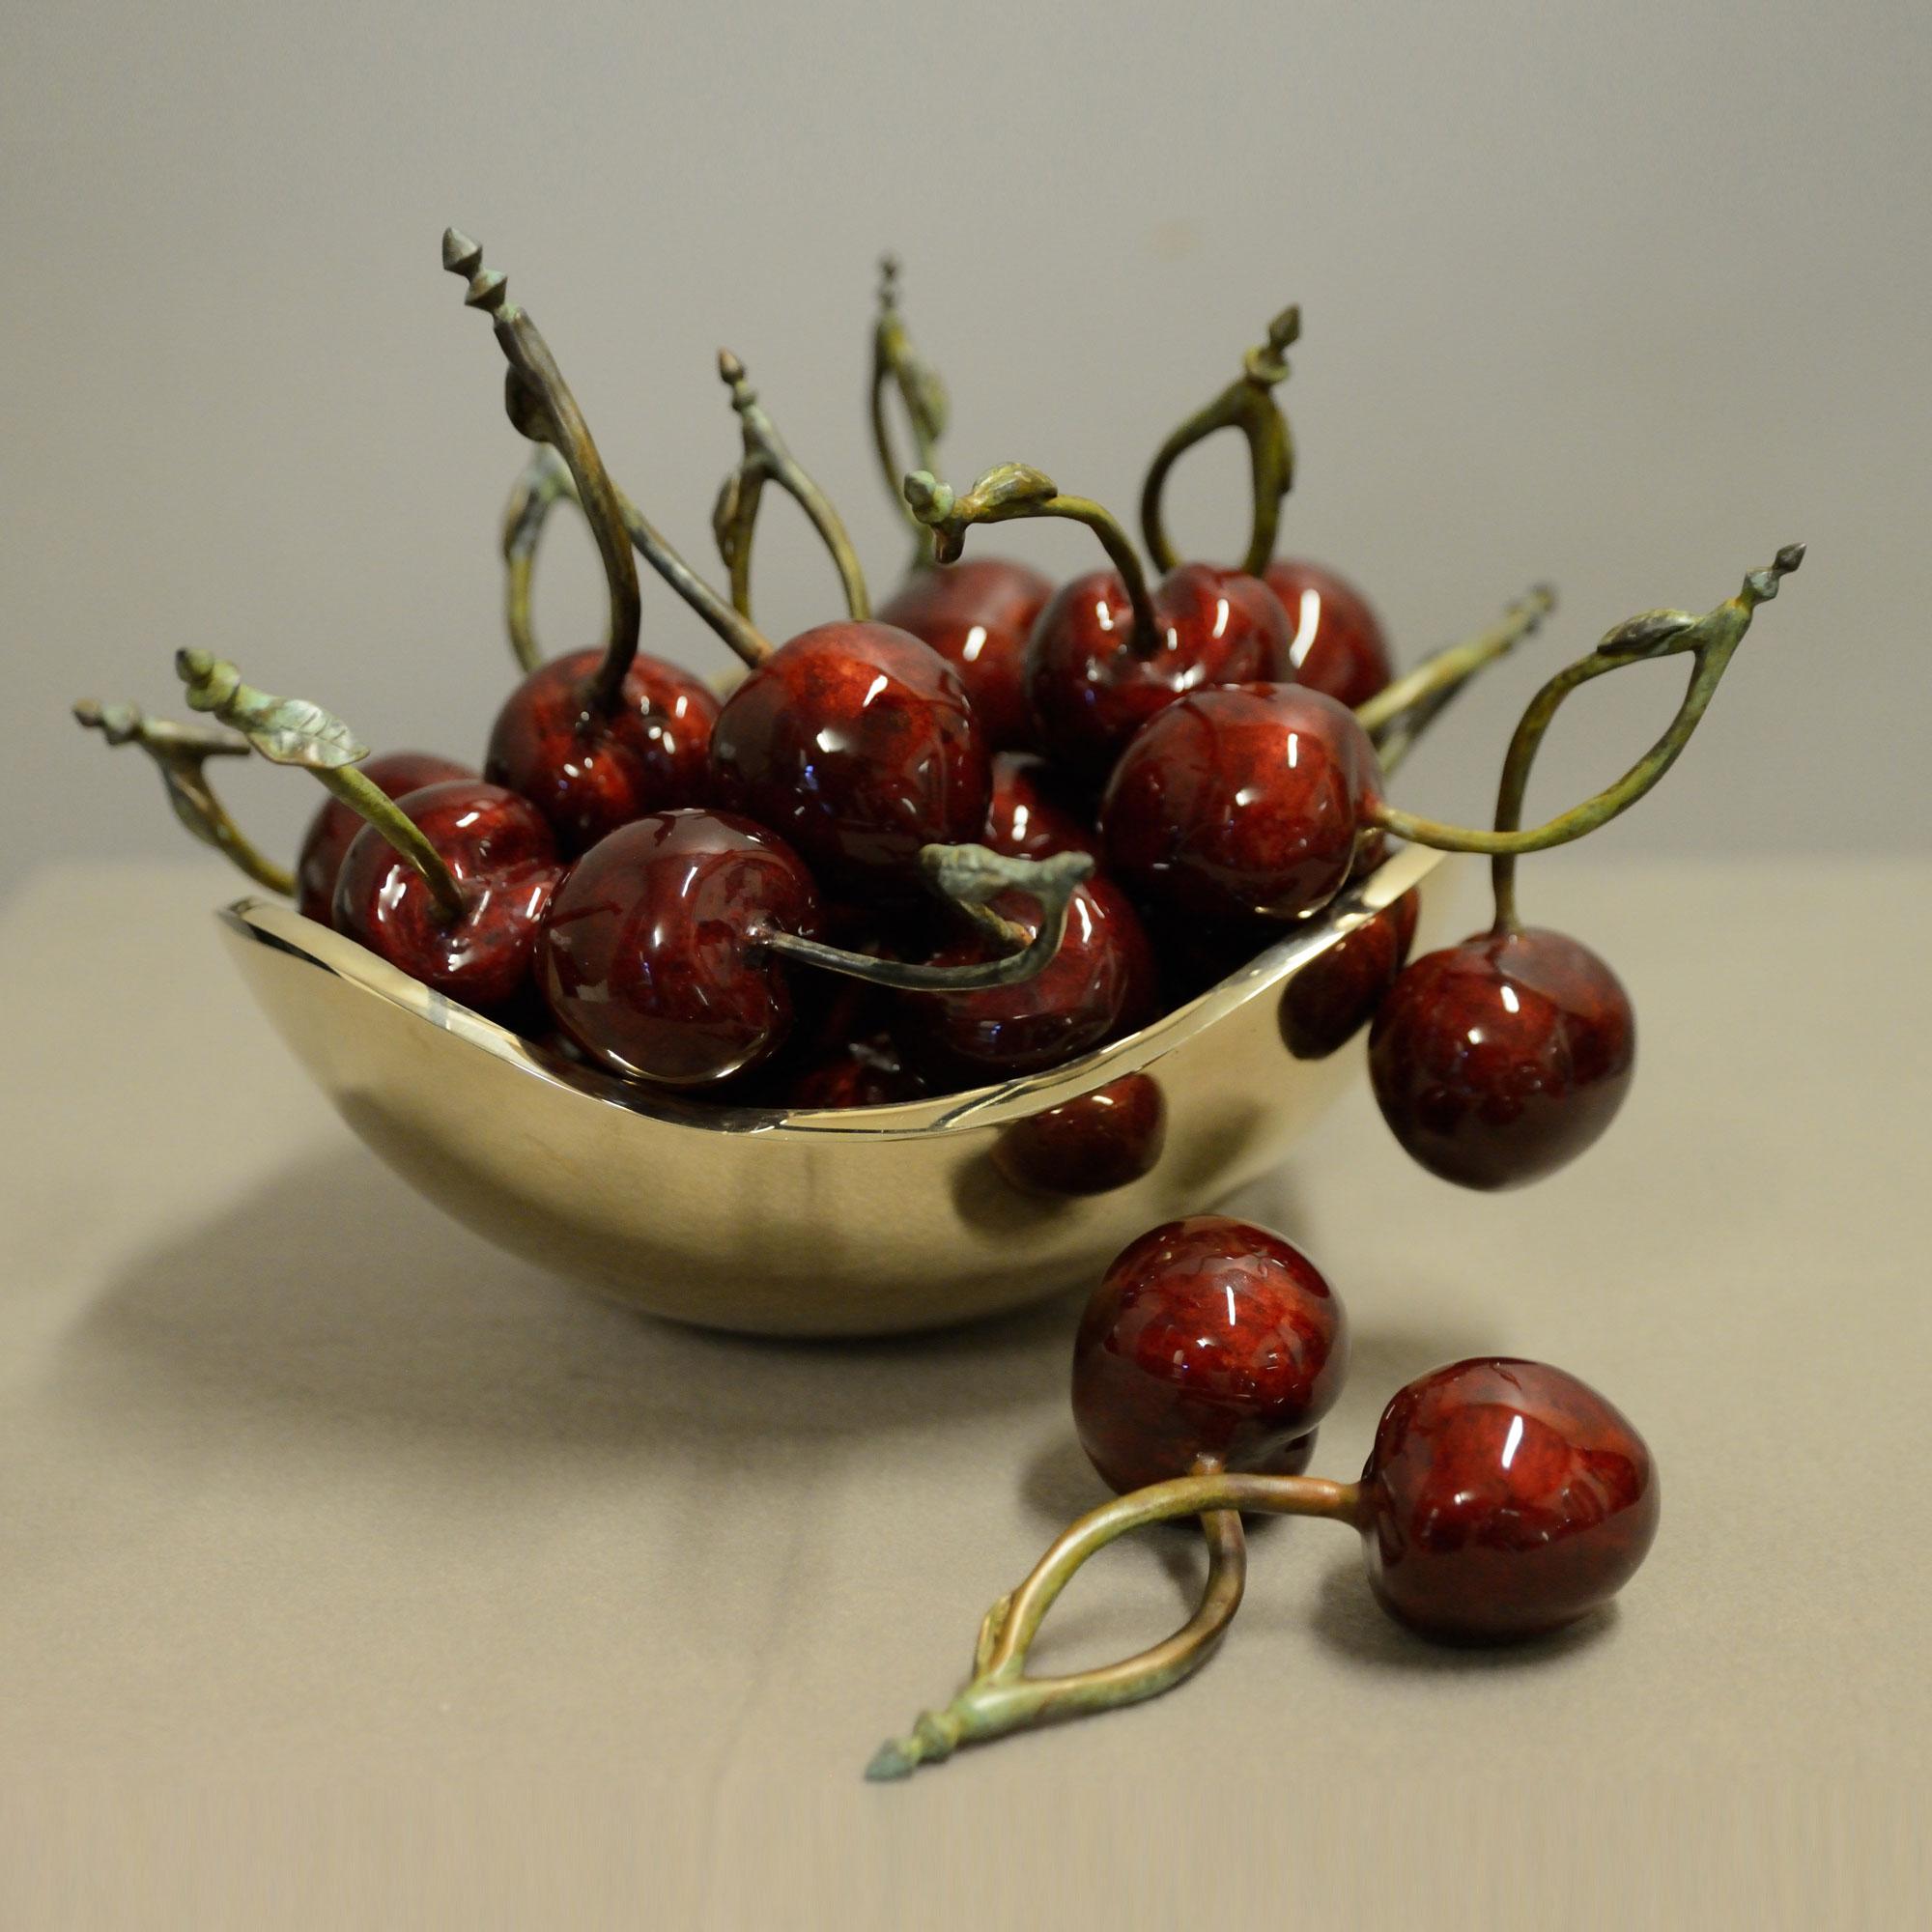 bowl-of-cherries-front